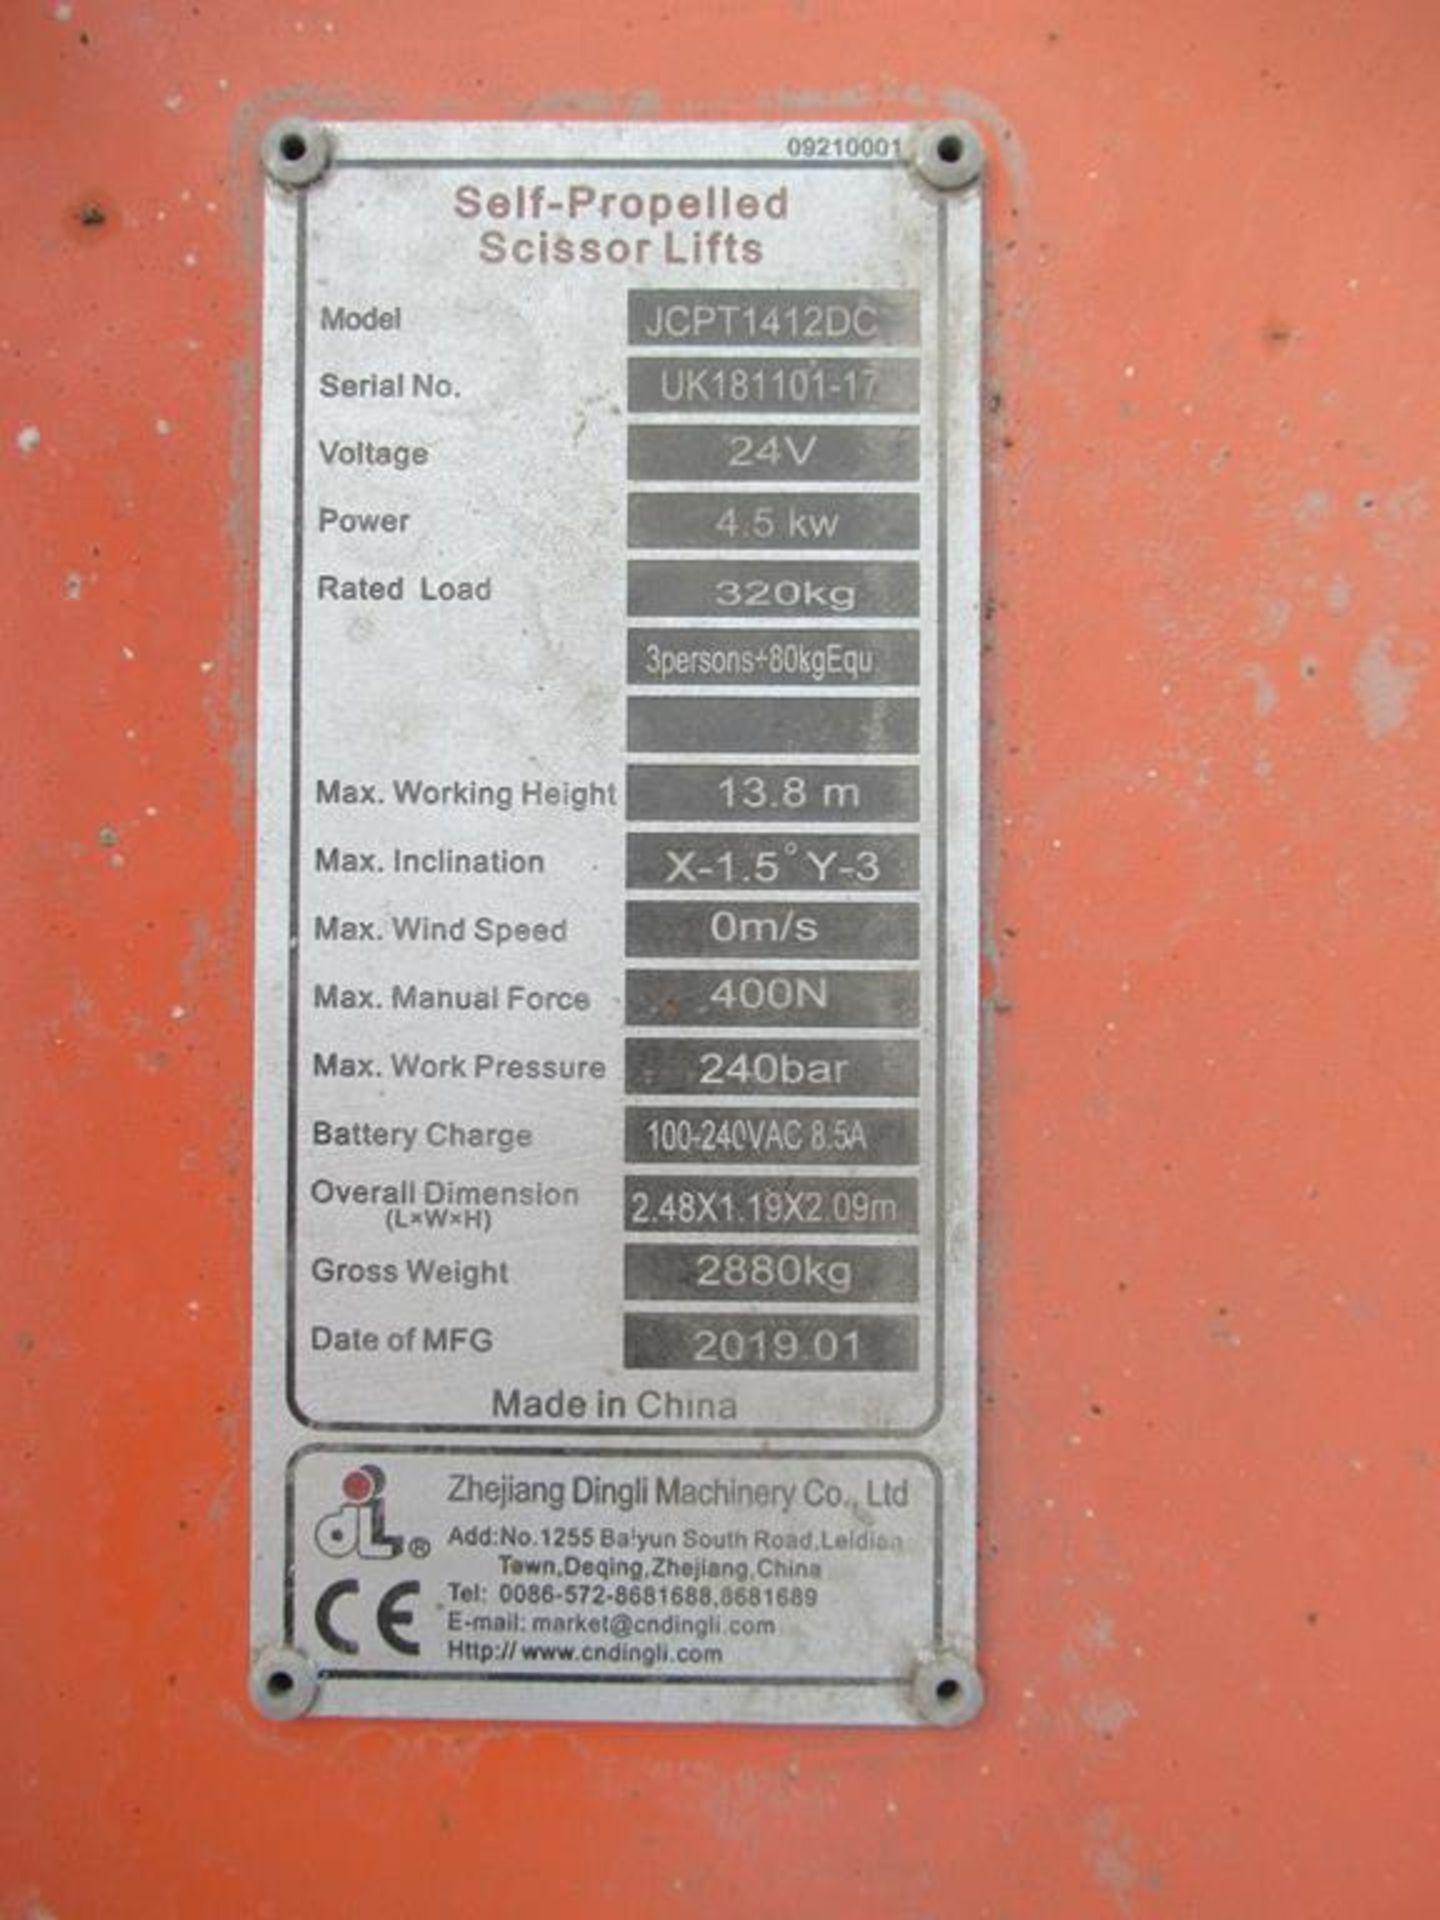 Dingli JCPT 1412 DC 24V electric scissor lift - Image 6 of 6